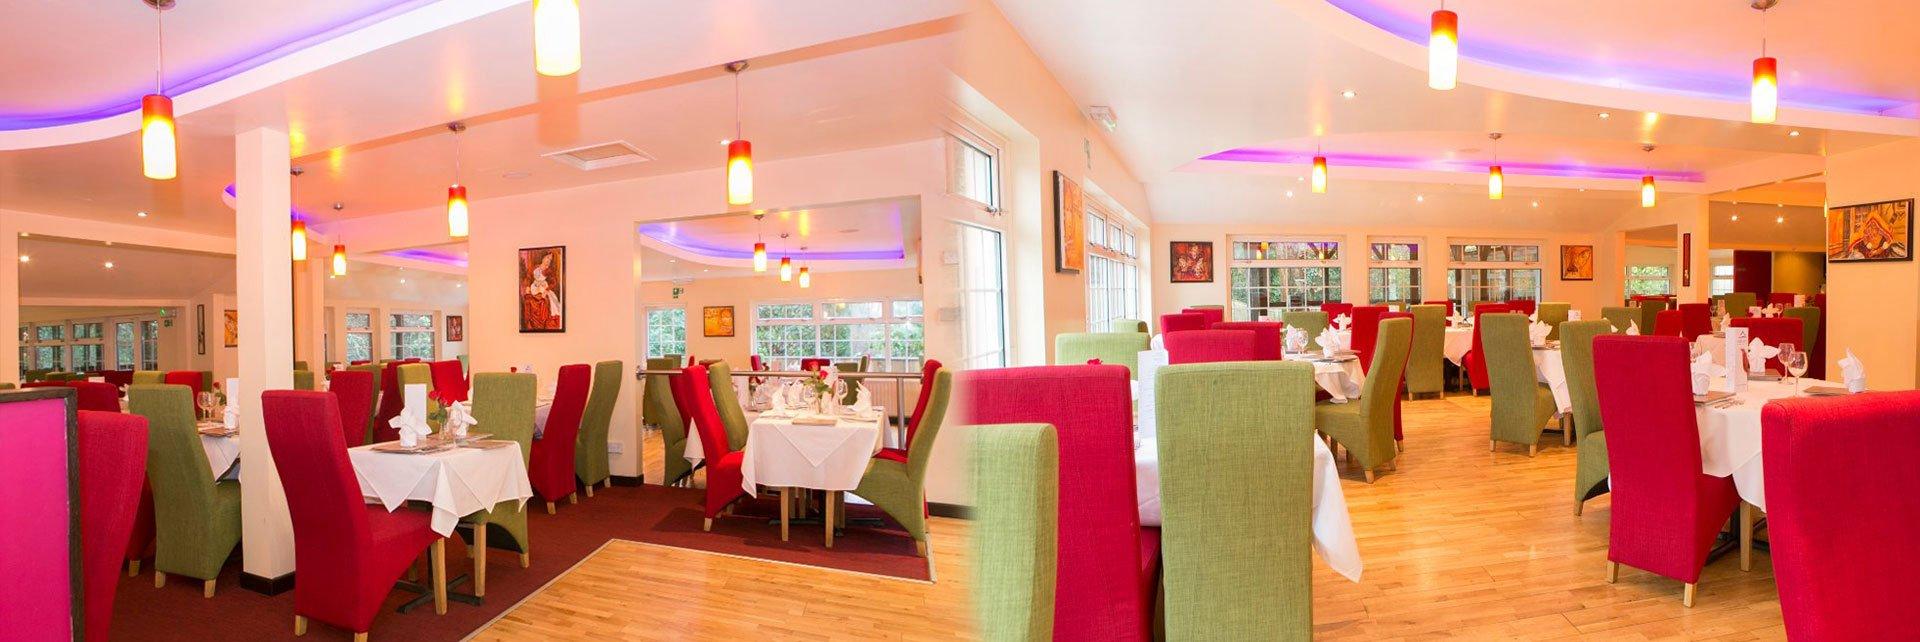 The 29029 Restaurant Wareham UK